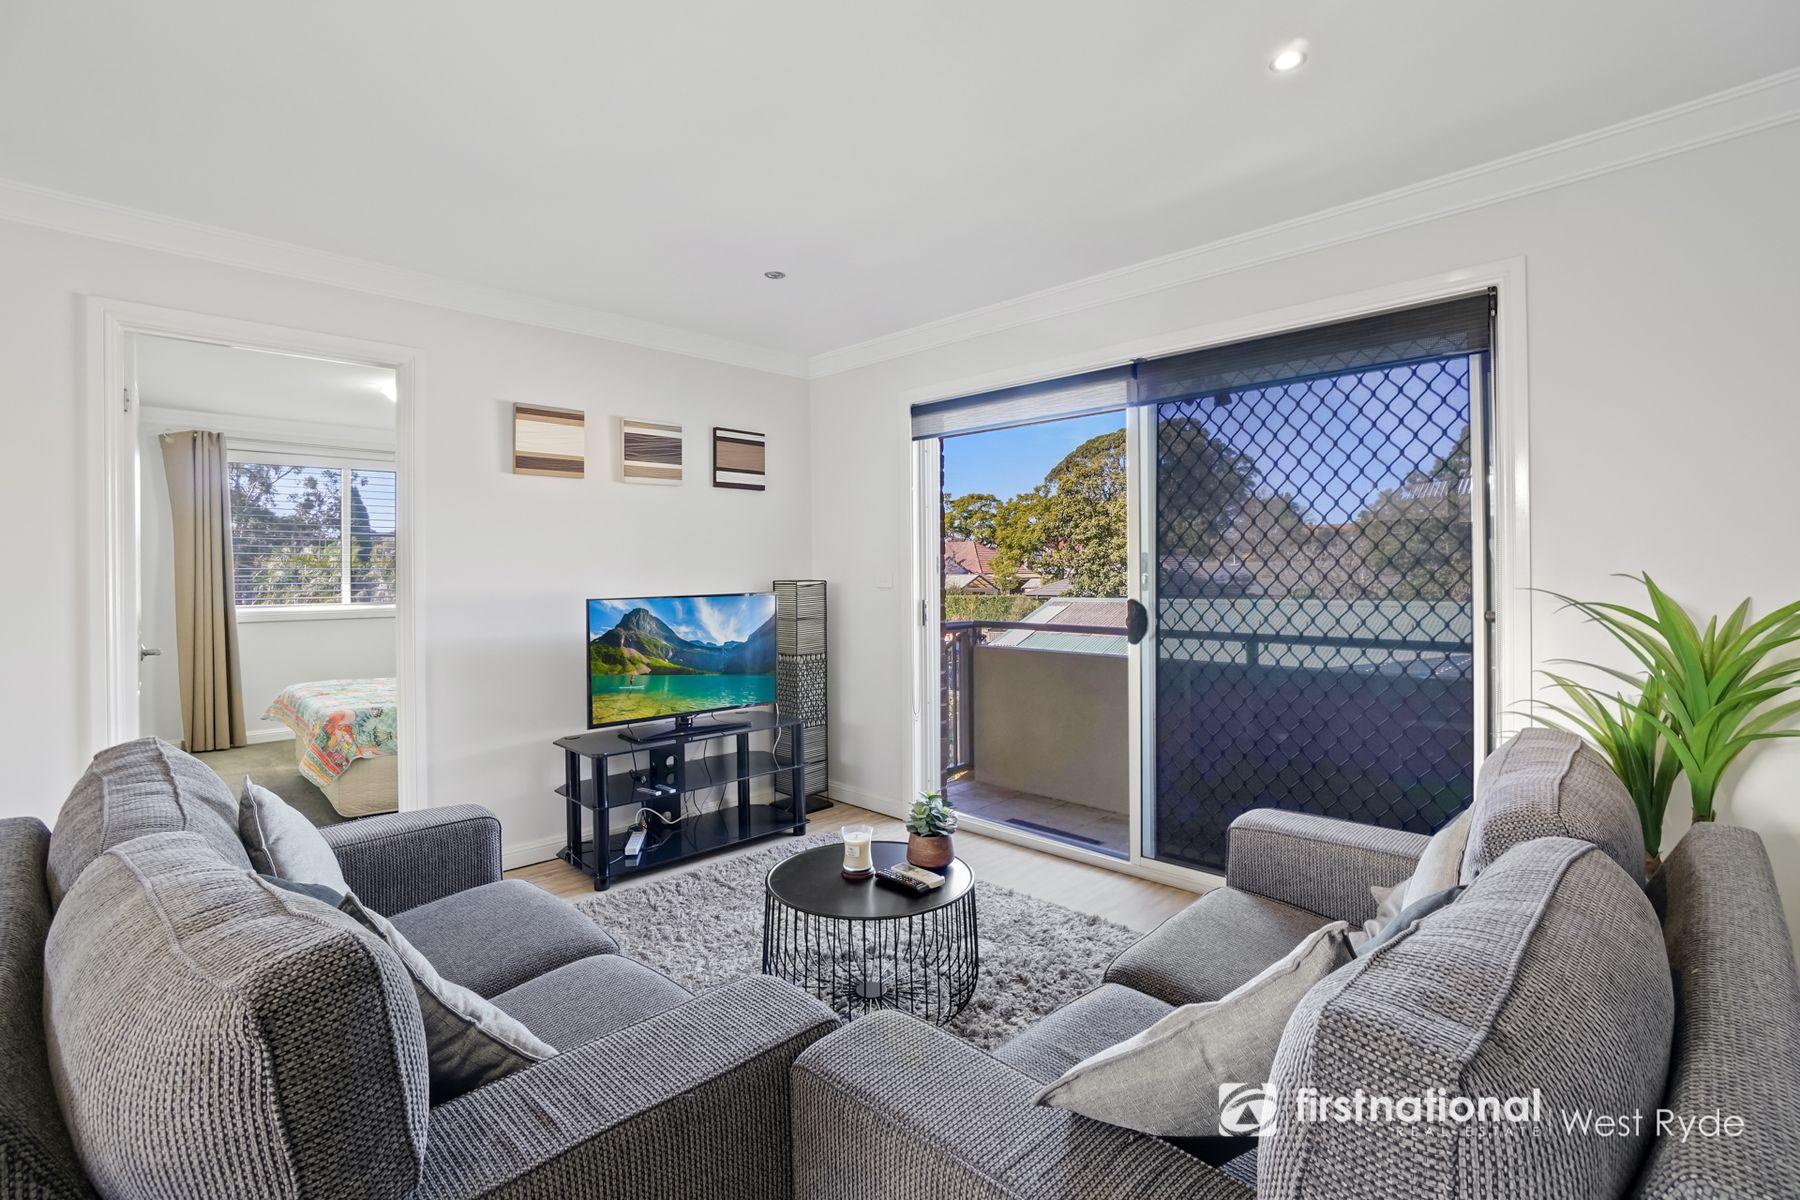 1/60 Denistone Road, Denistone West, NSW 2114